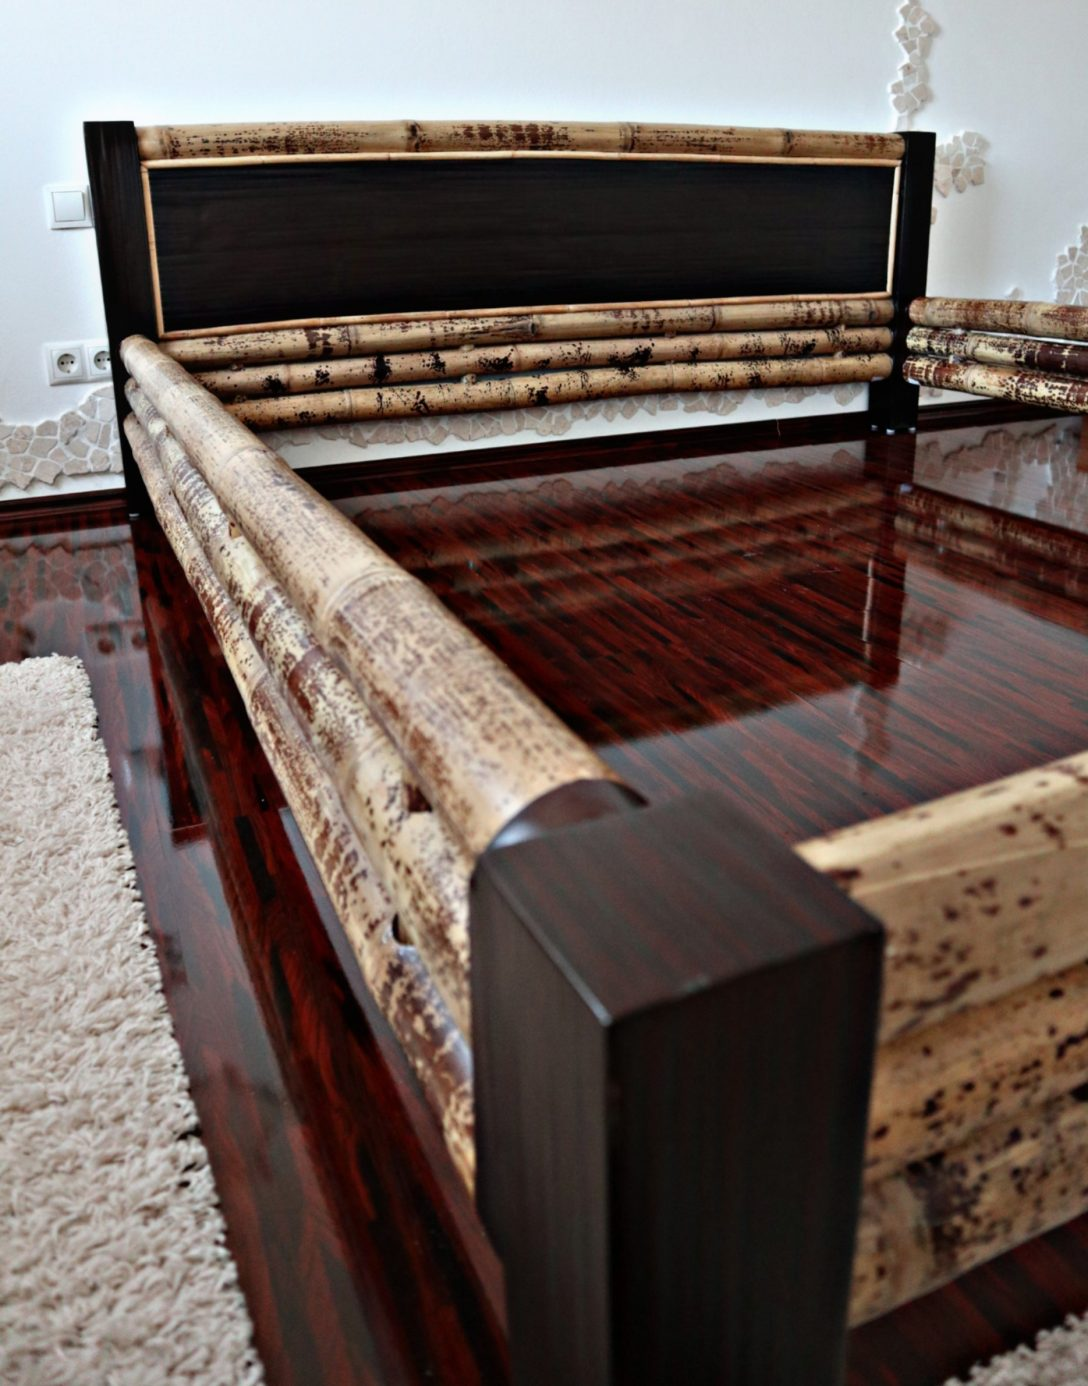 Large Size of Bambus Bett Unser Neues Bambusbett Inkl Tipps Fr Einen Gesunden Schlaf Rauch Betten Bopita Aus Paletten Kaufen Ausgefallene Günstig 180x200 Lattenrost Bett Bambus Bett